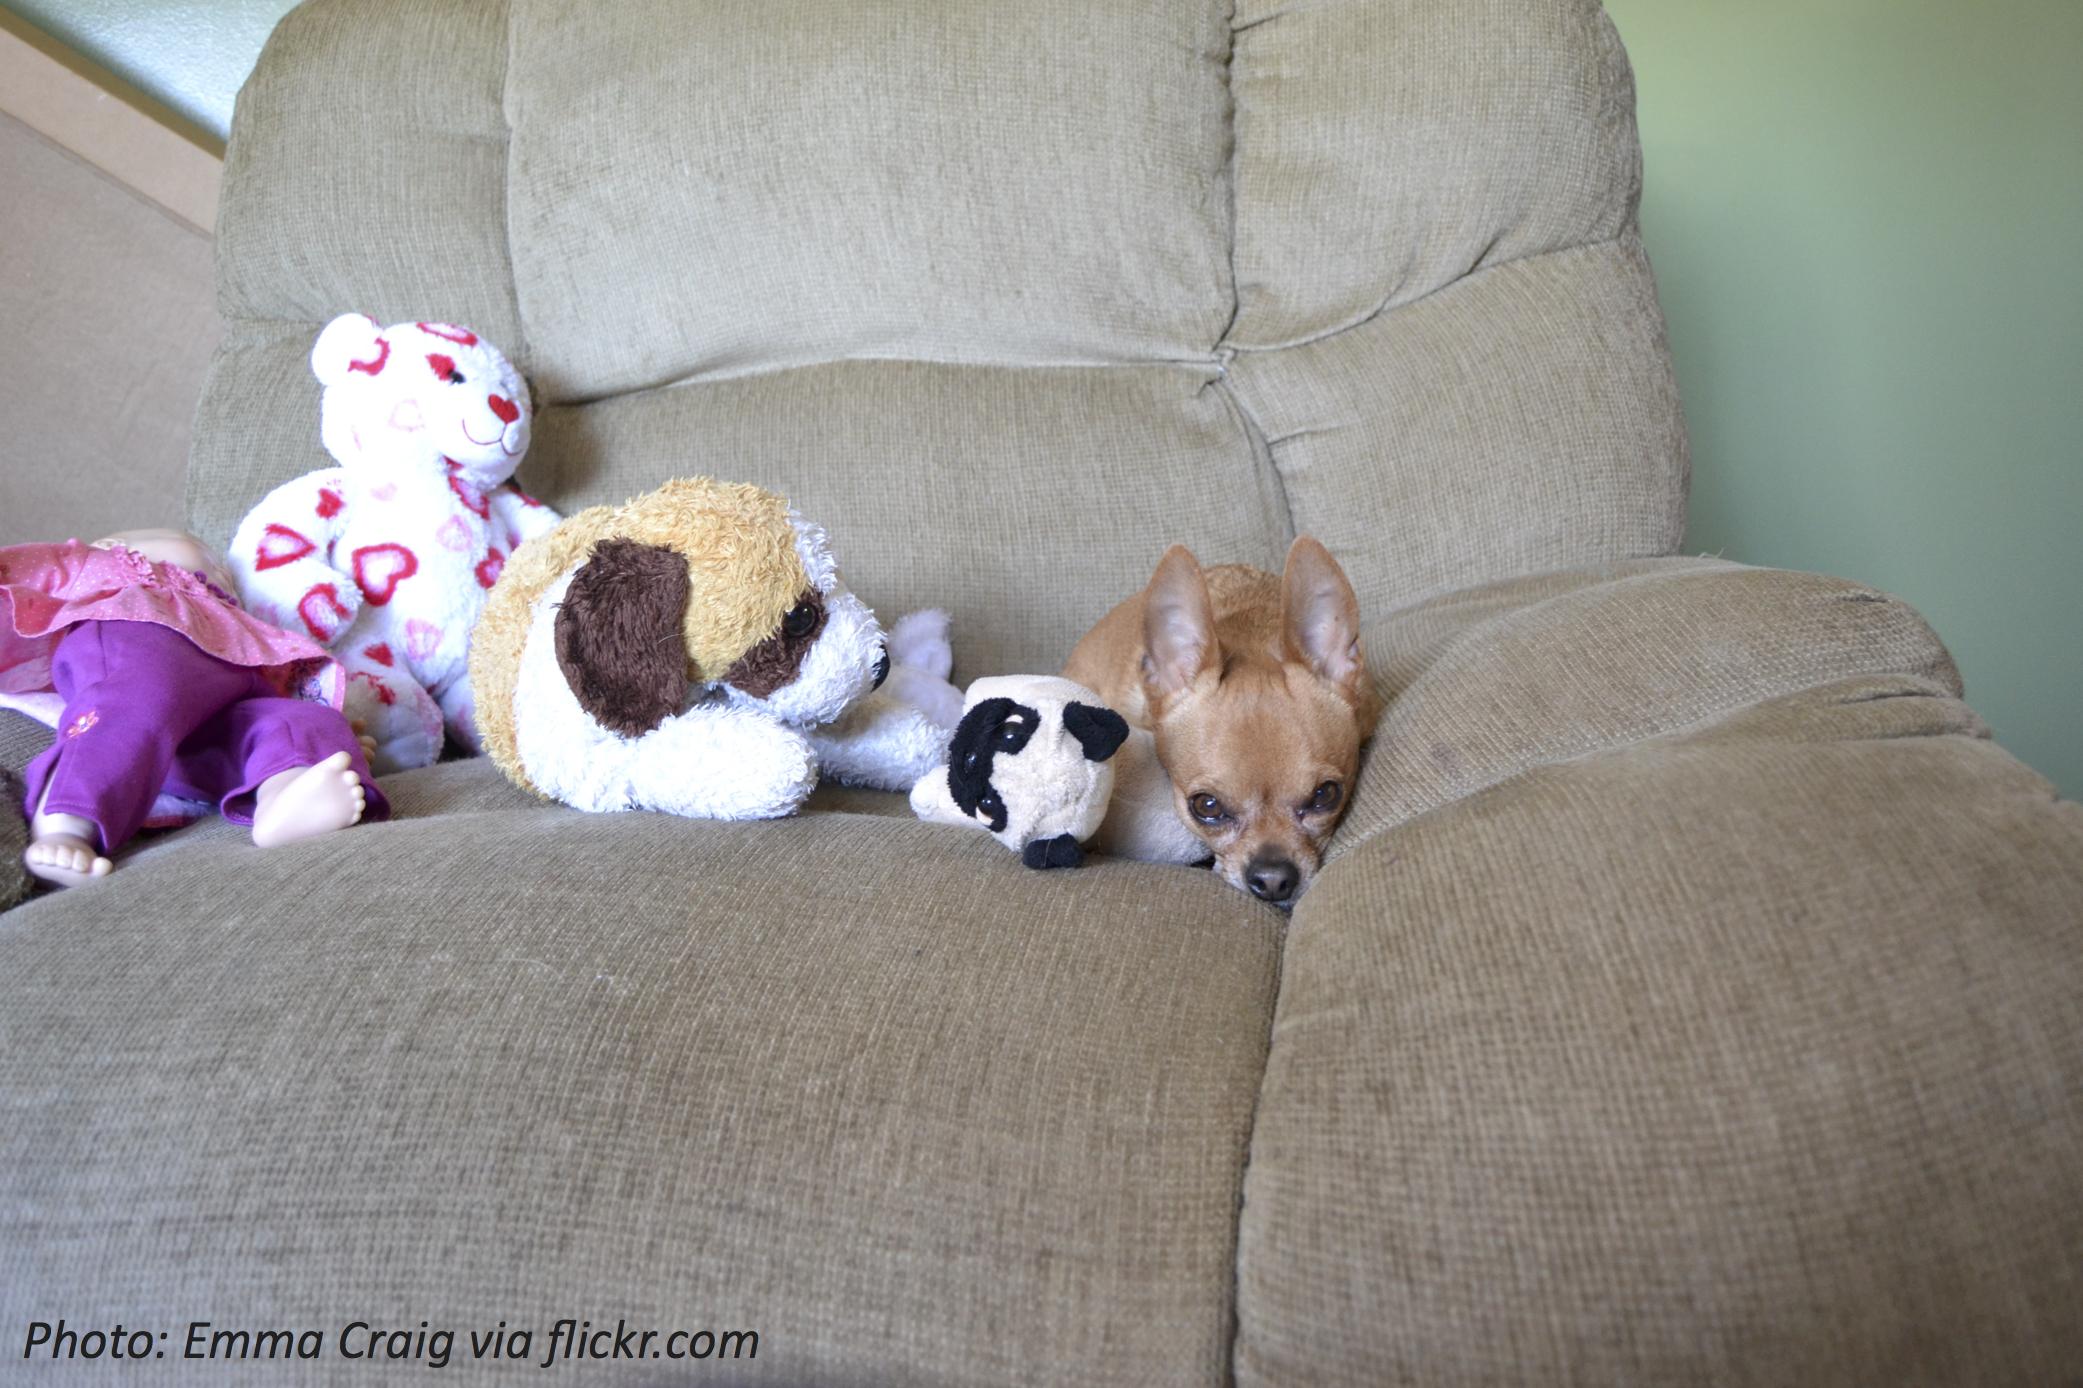 A Year of Stuffed Animals